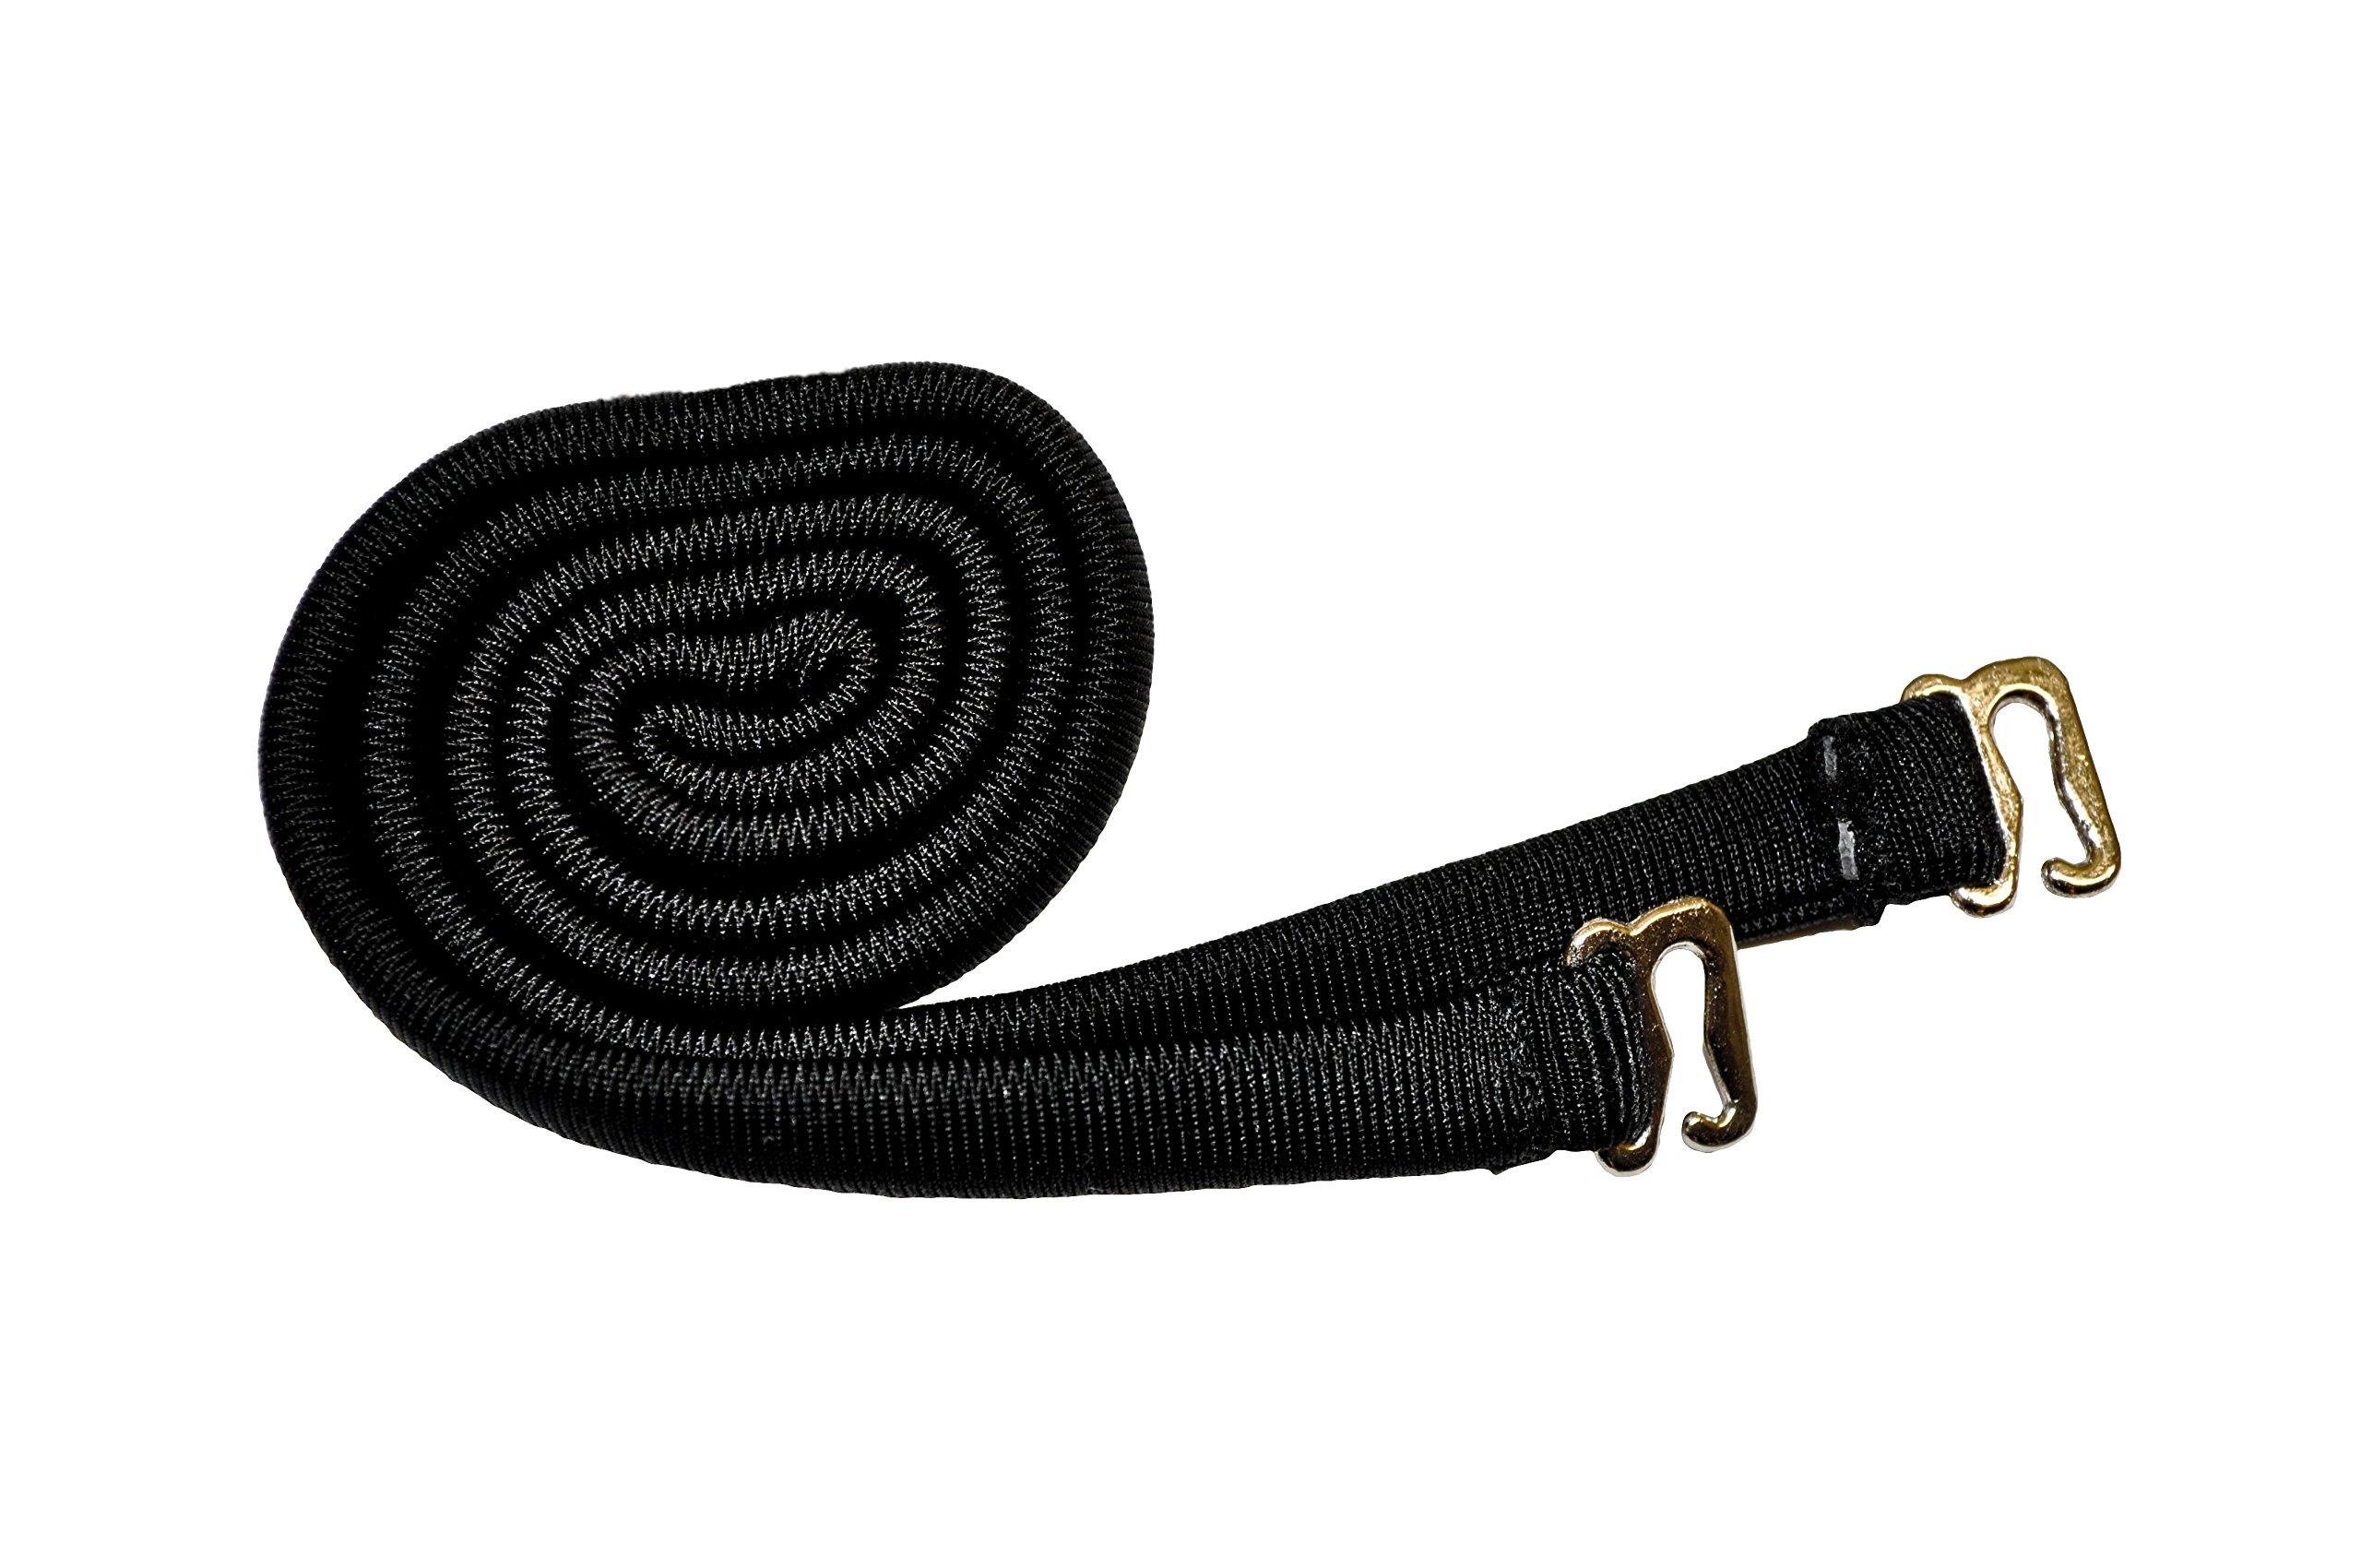 Spare Swimsuit Strap for Bikini, Bandeau, or Tankini,Small,Jet Black